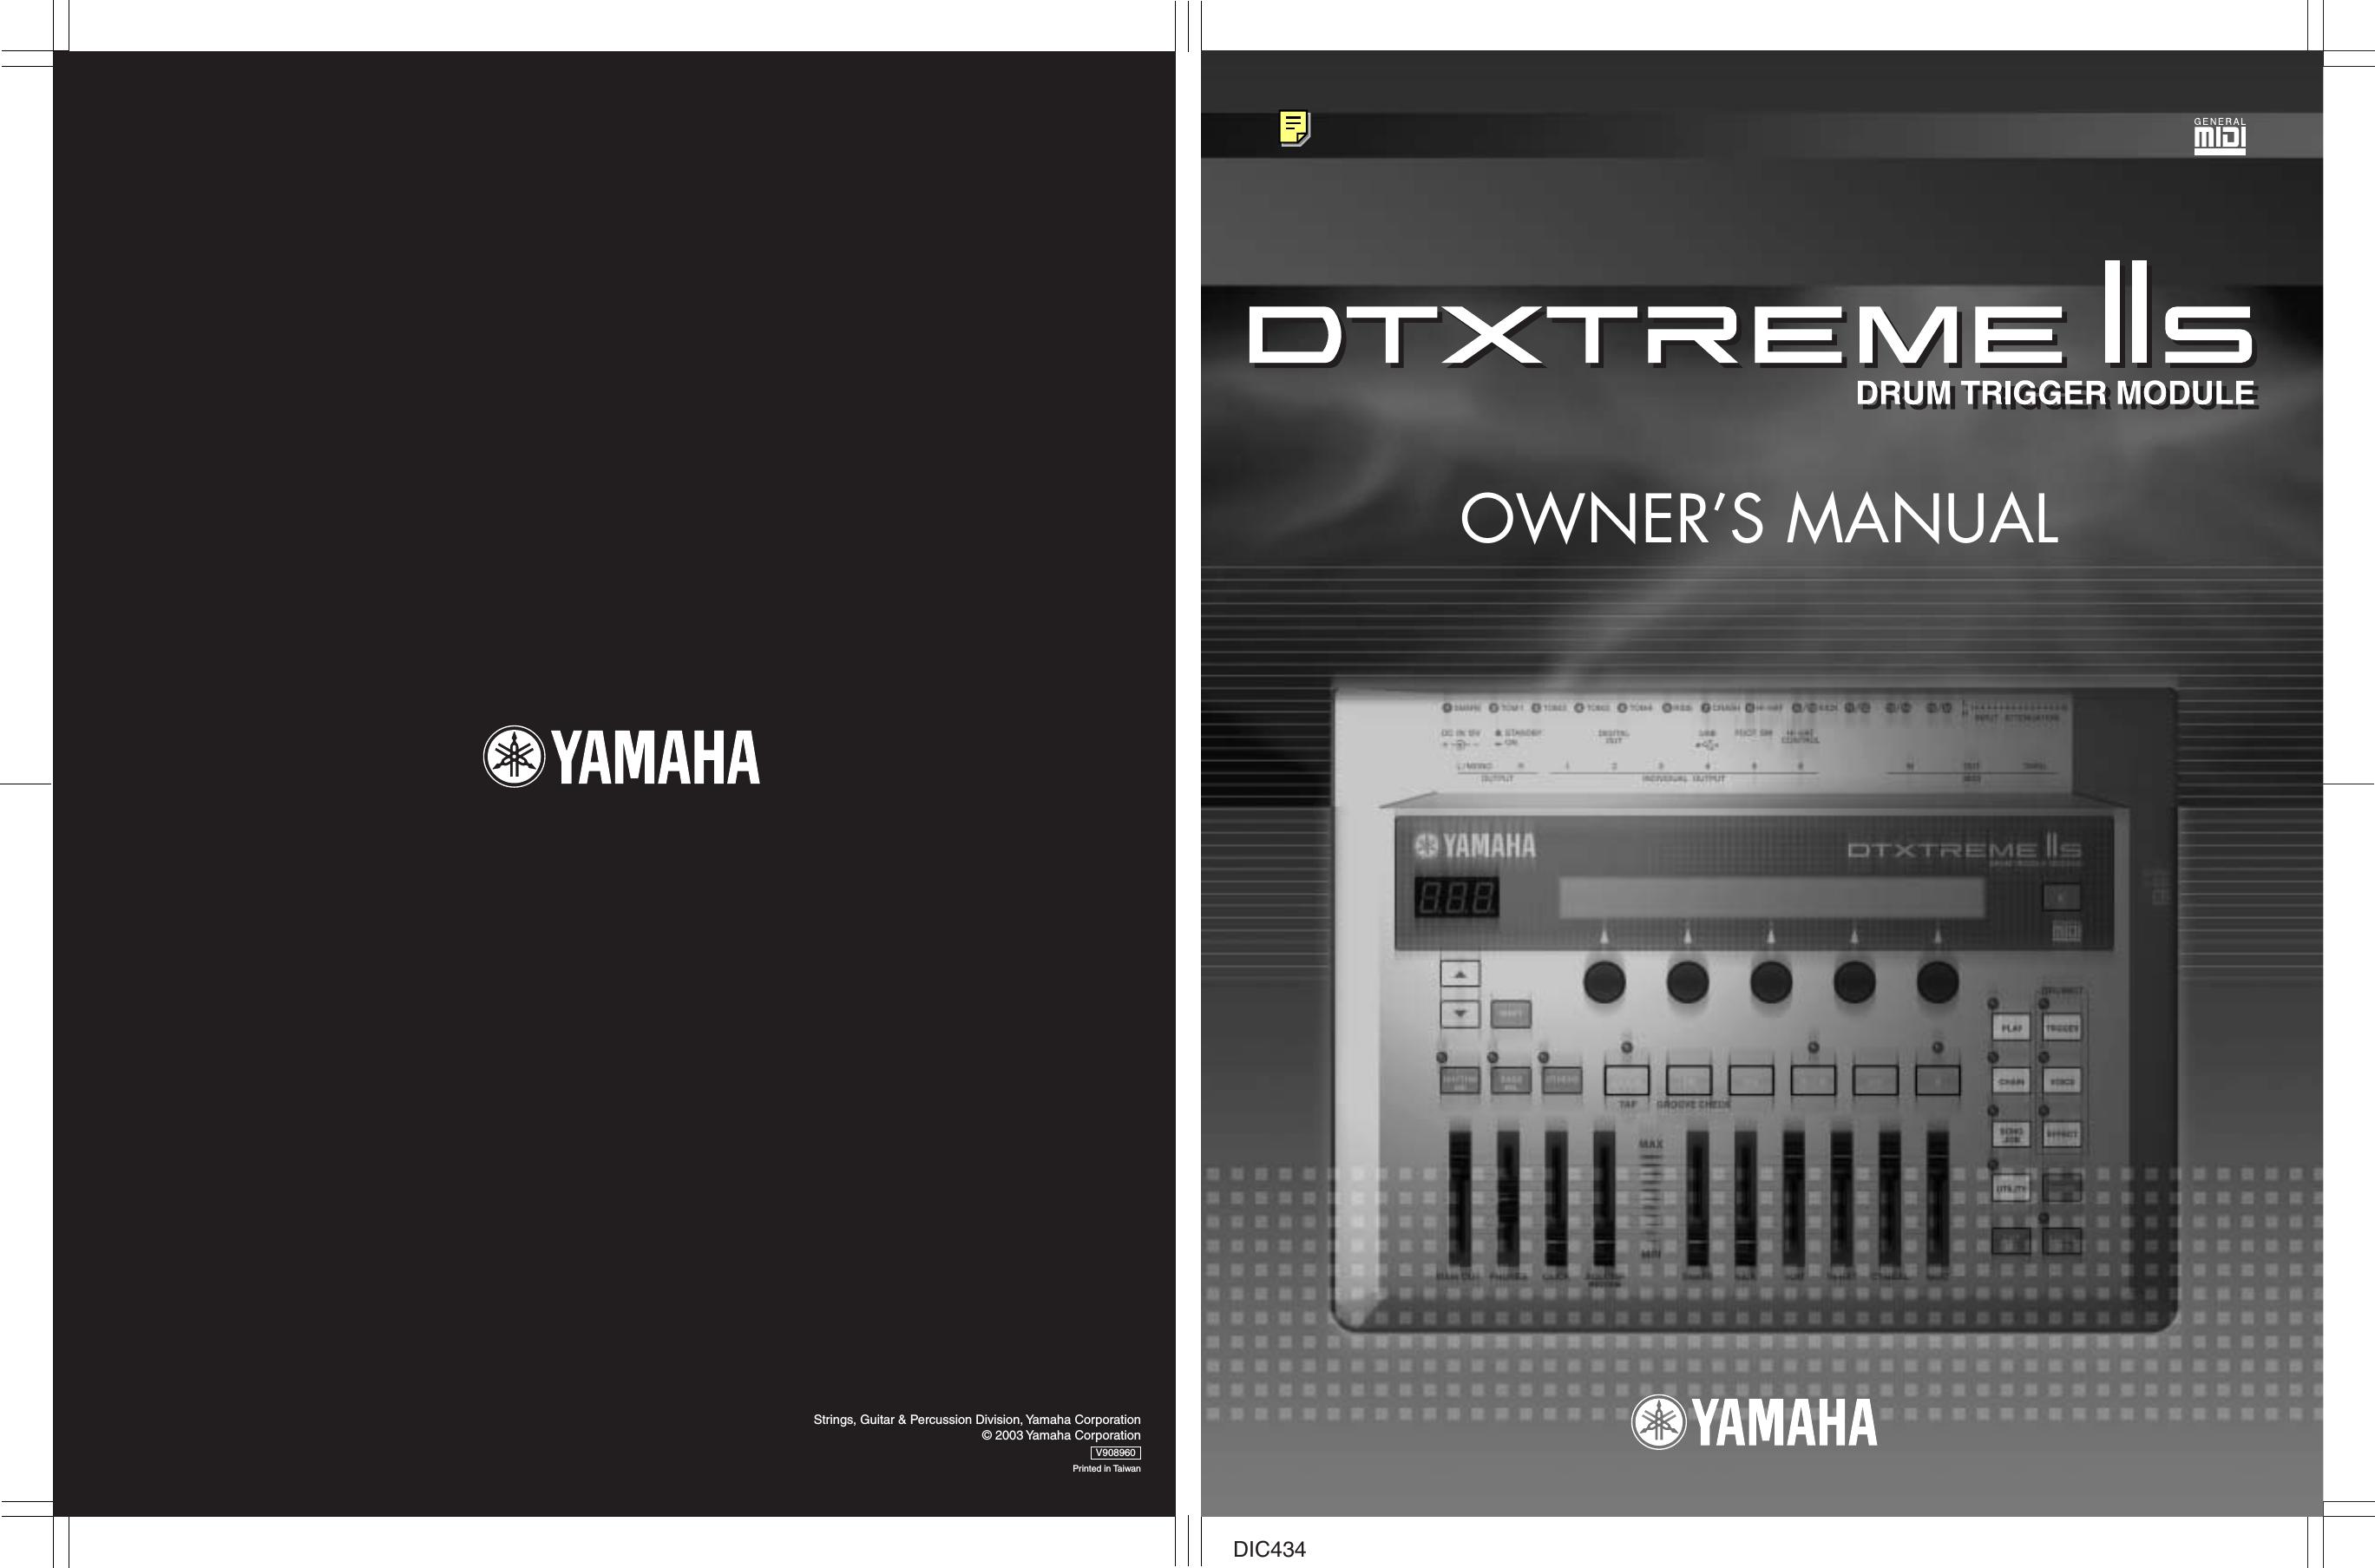 YAMAHA DTXTREME IIS PCY150S 3 ZONE RIDE CYMBAL pcy-150s